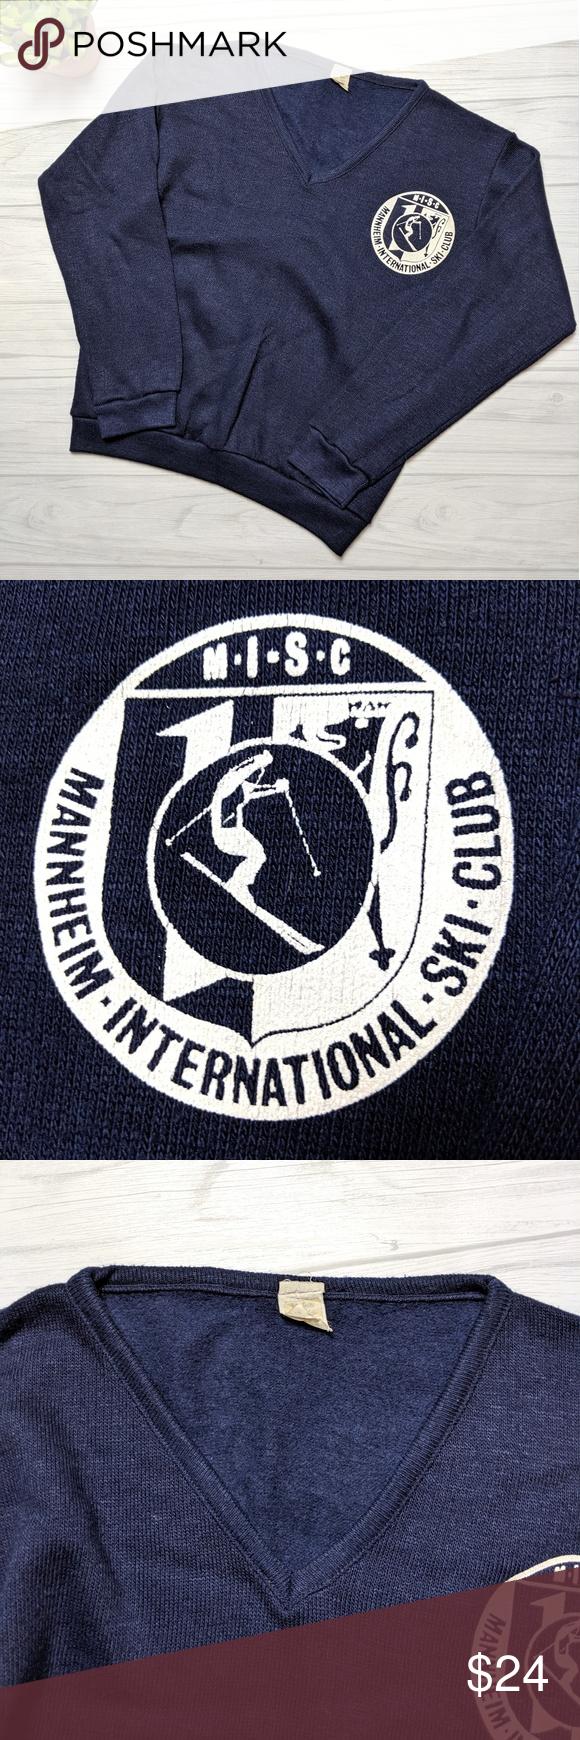 Vintage Mannheim International Ski Club Sweater Sweater Club Ski Club Vintage Sweaters